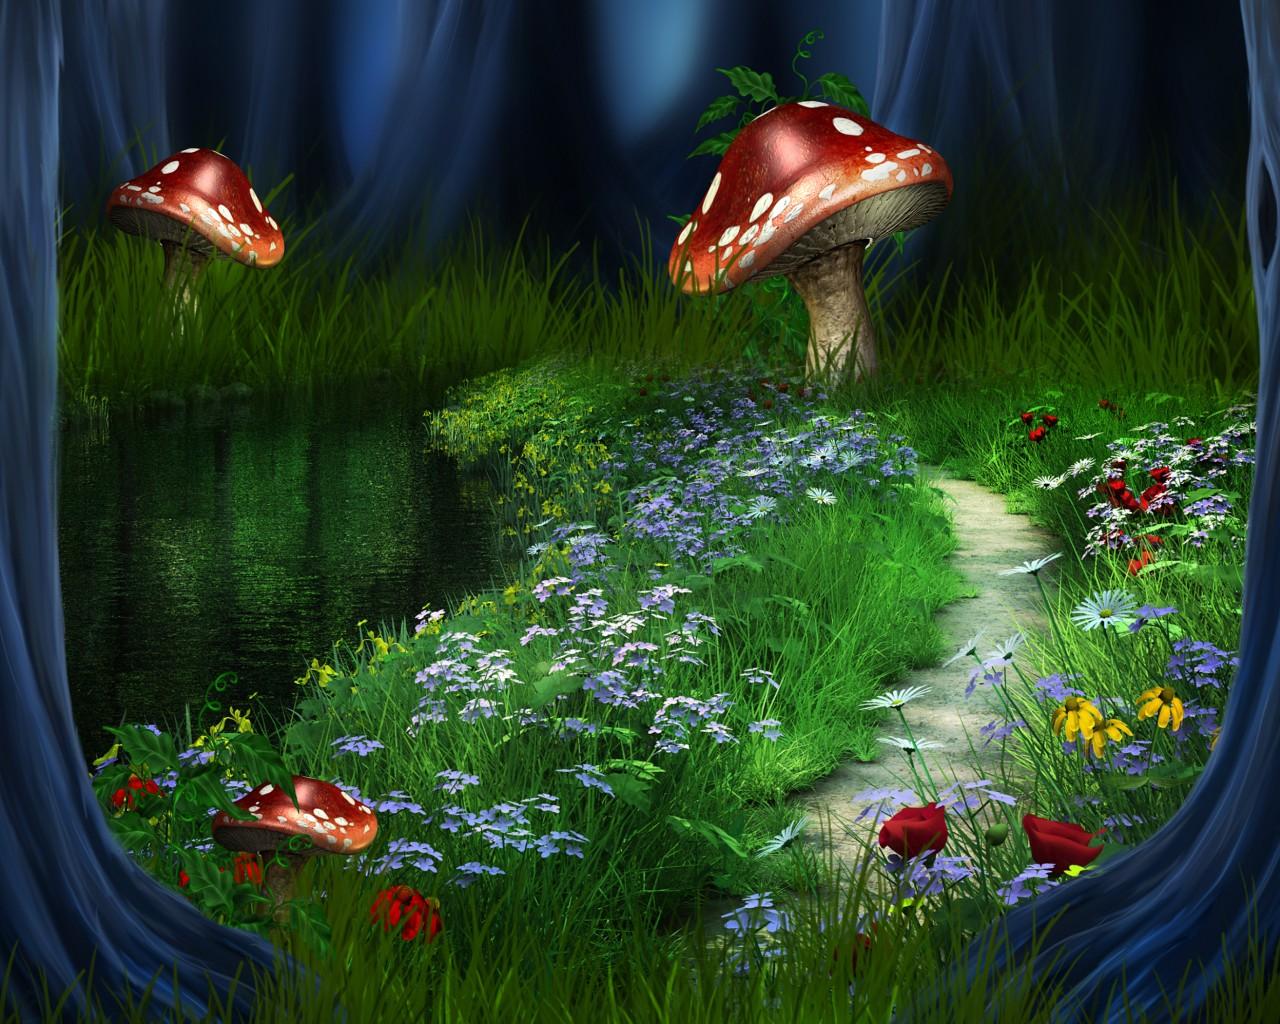 Сказочный лес - обои на рабочий стол ...: www.mobilmusic.ru/wallpaper.php?id=1187983